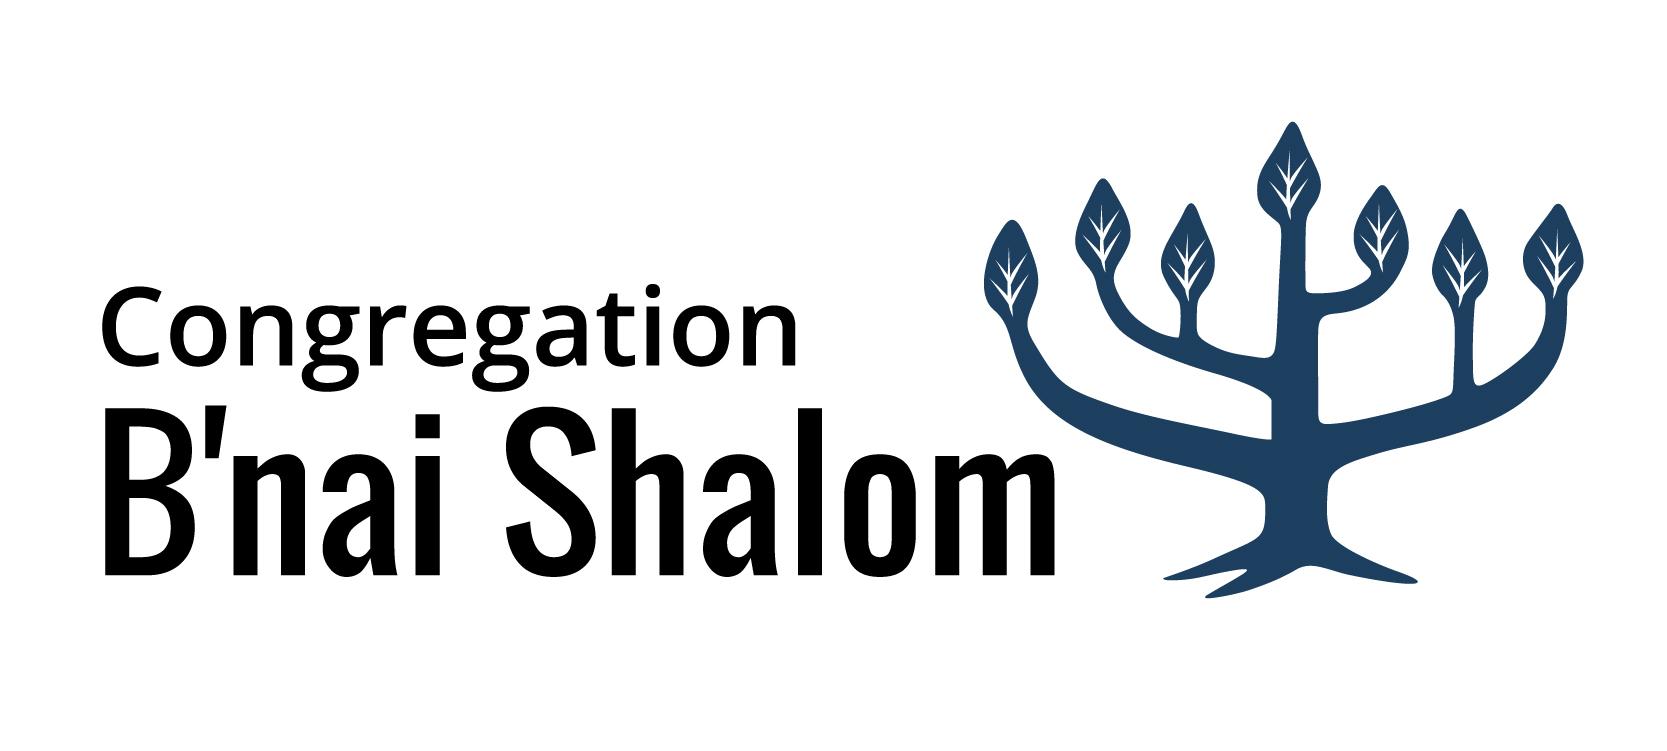 Congregation B'nai Shalom